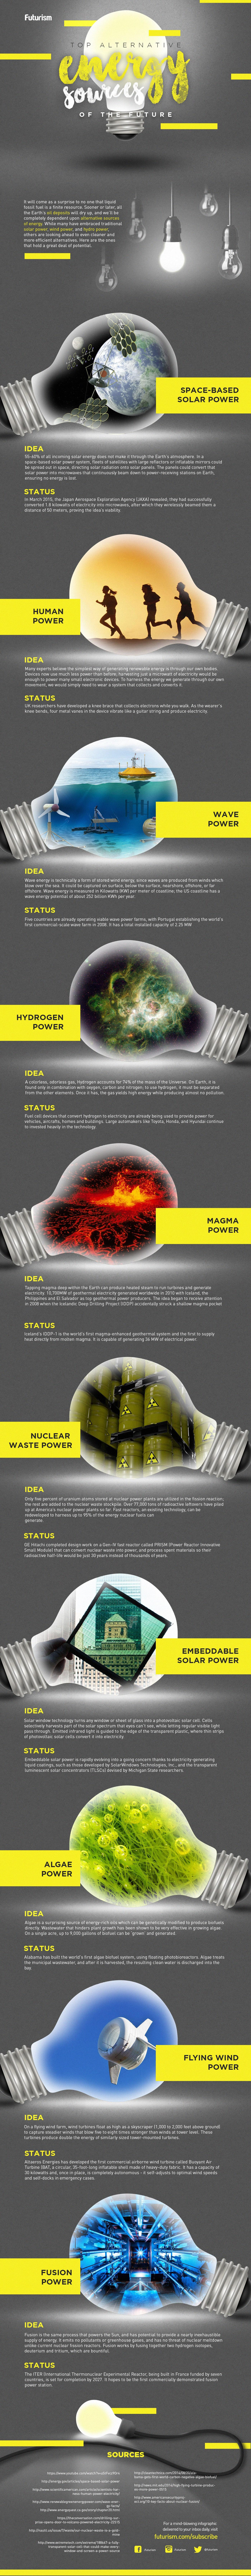 energie del futuro